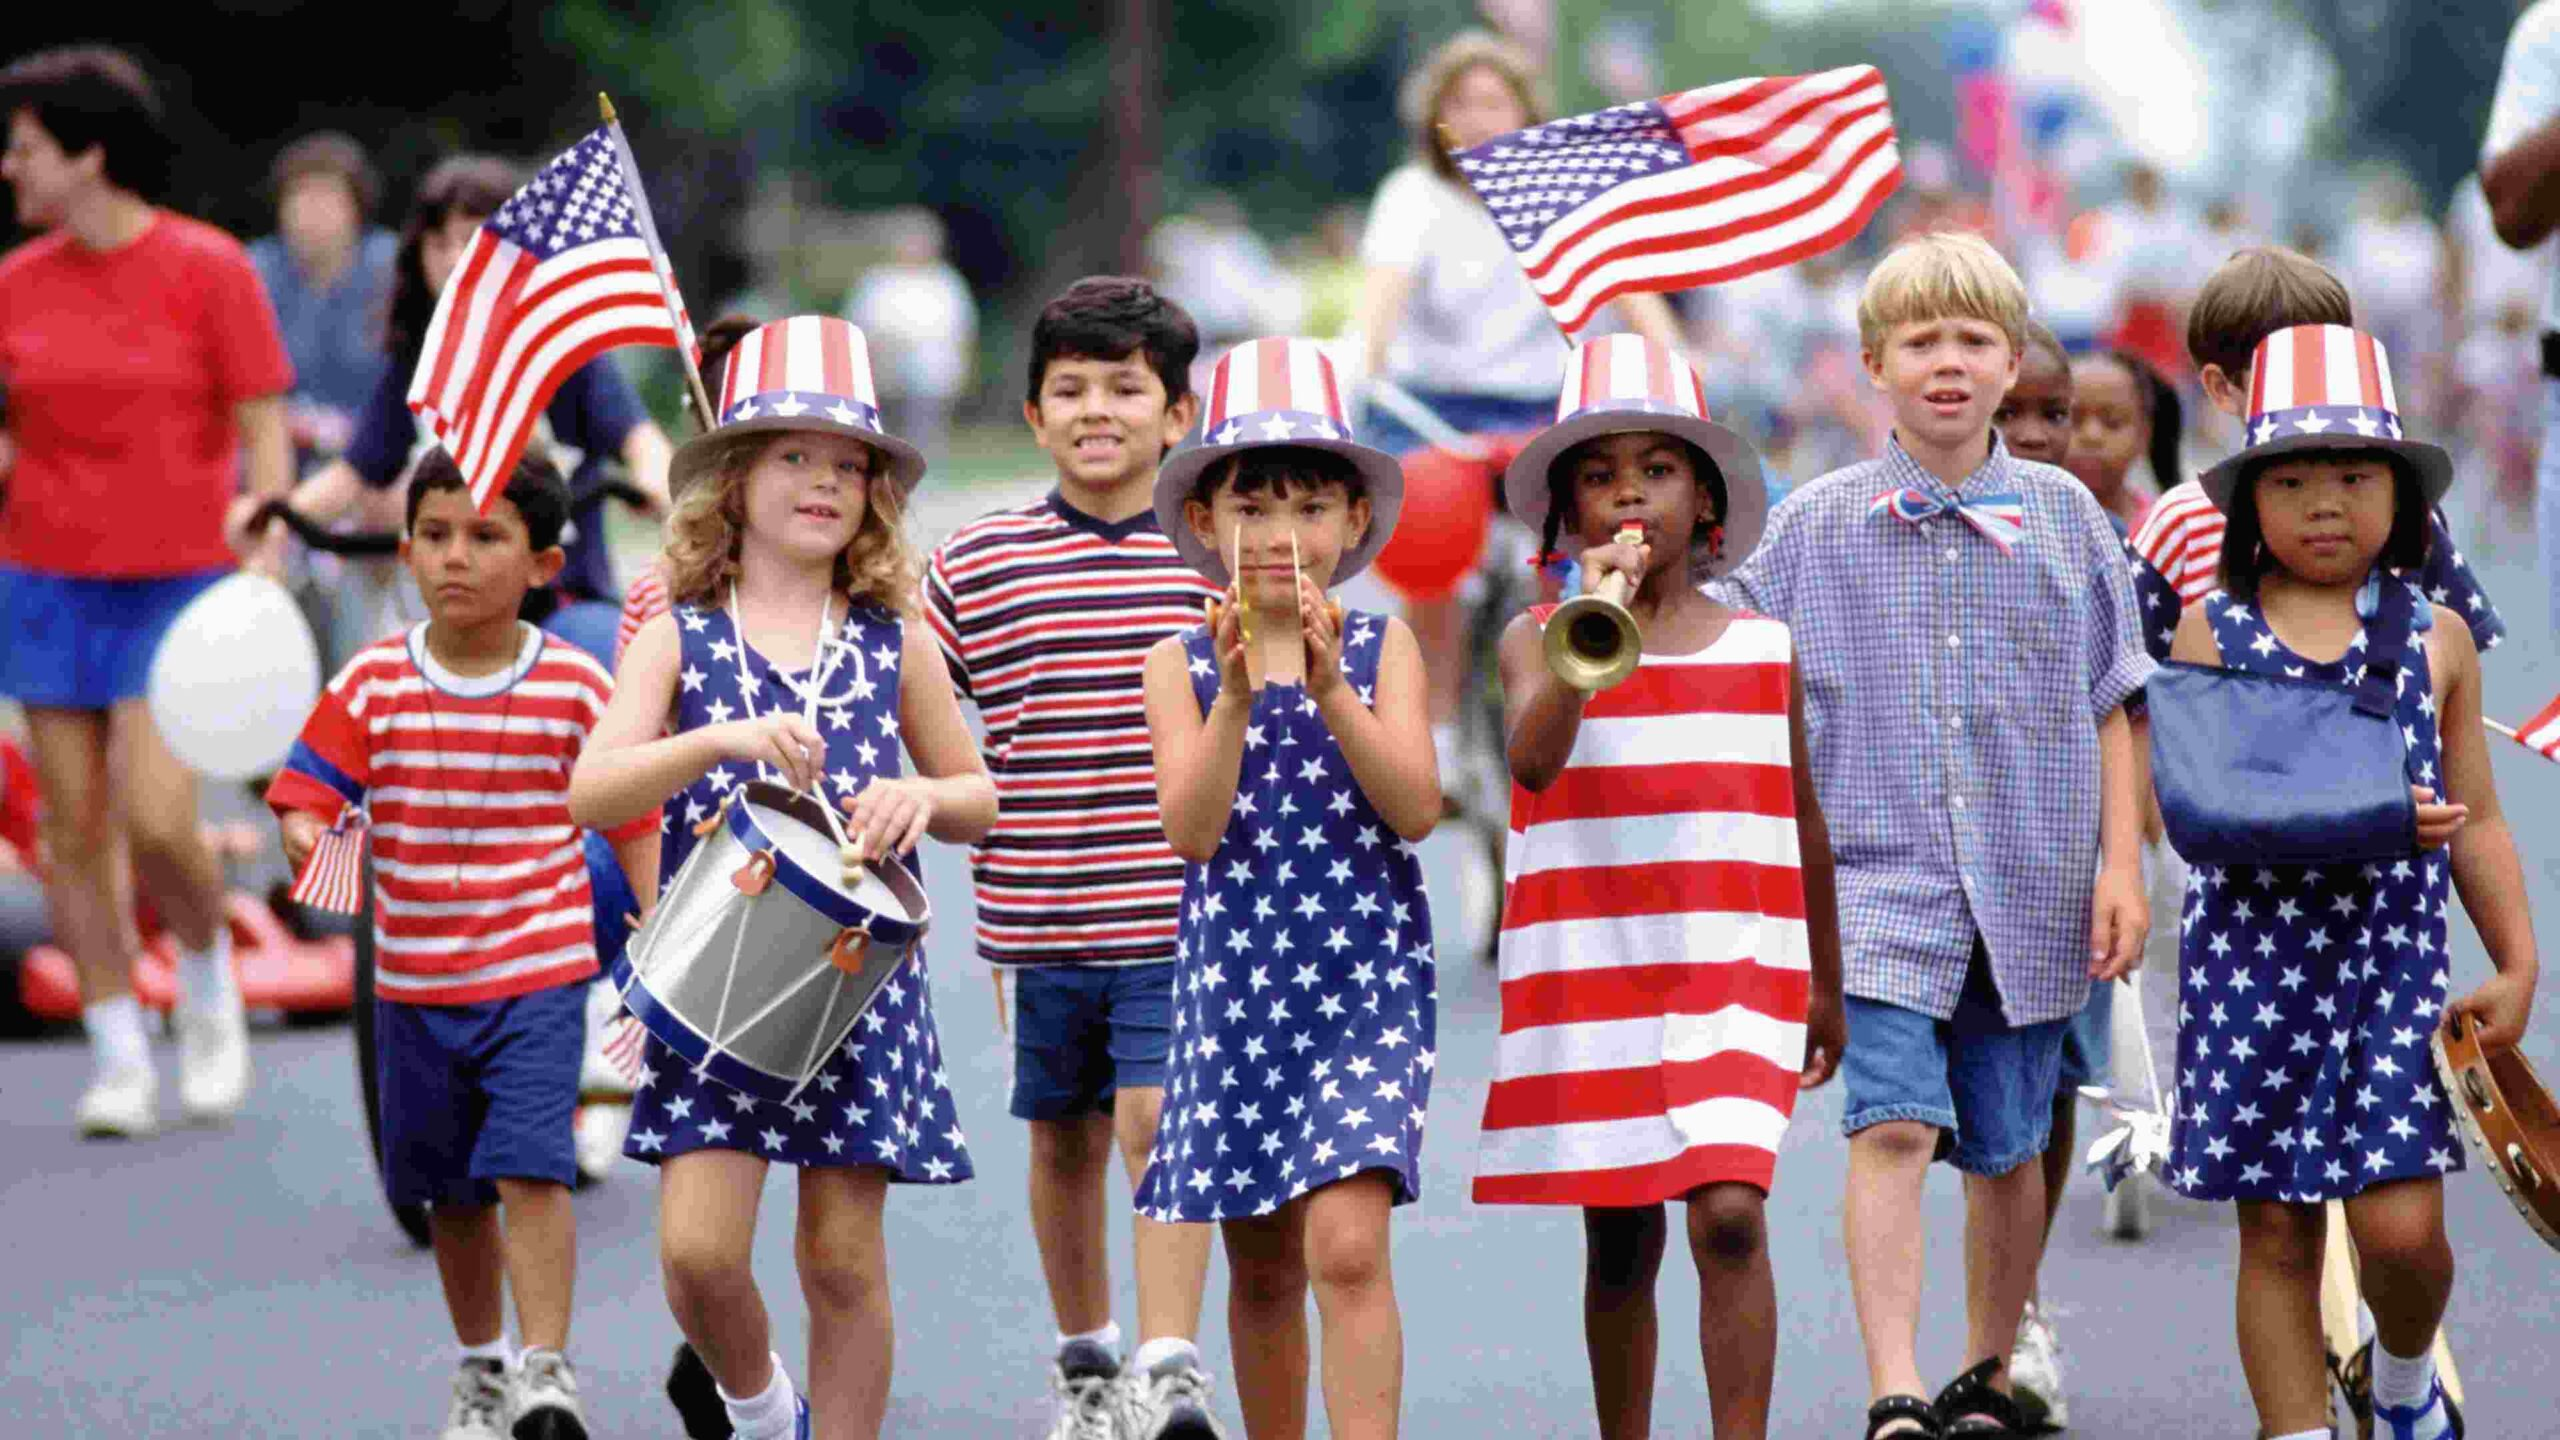 Kids Celebrating Usa Labor Day 2020 Holiday